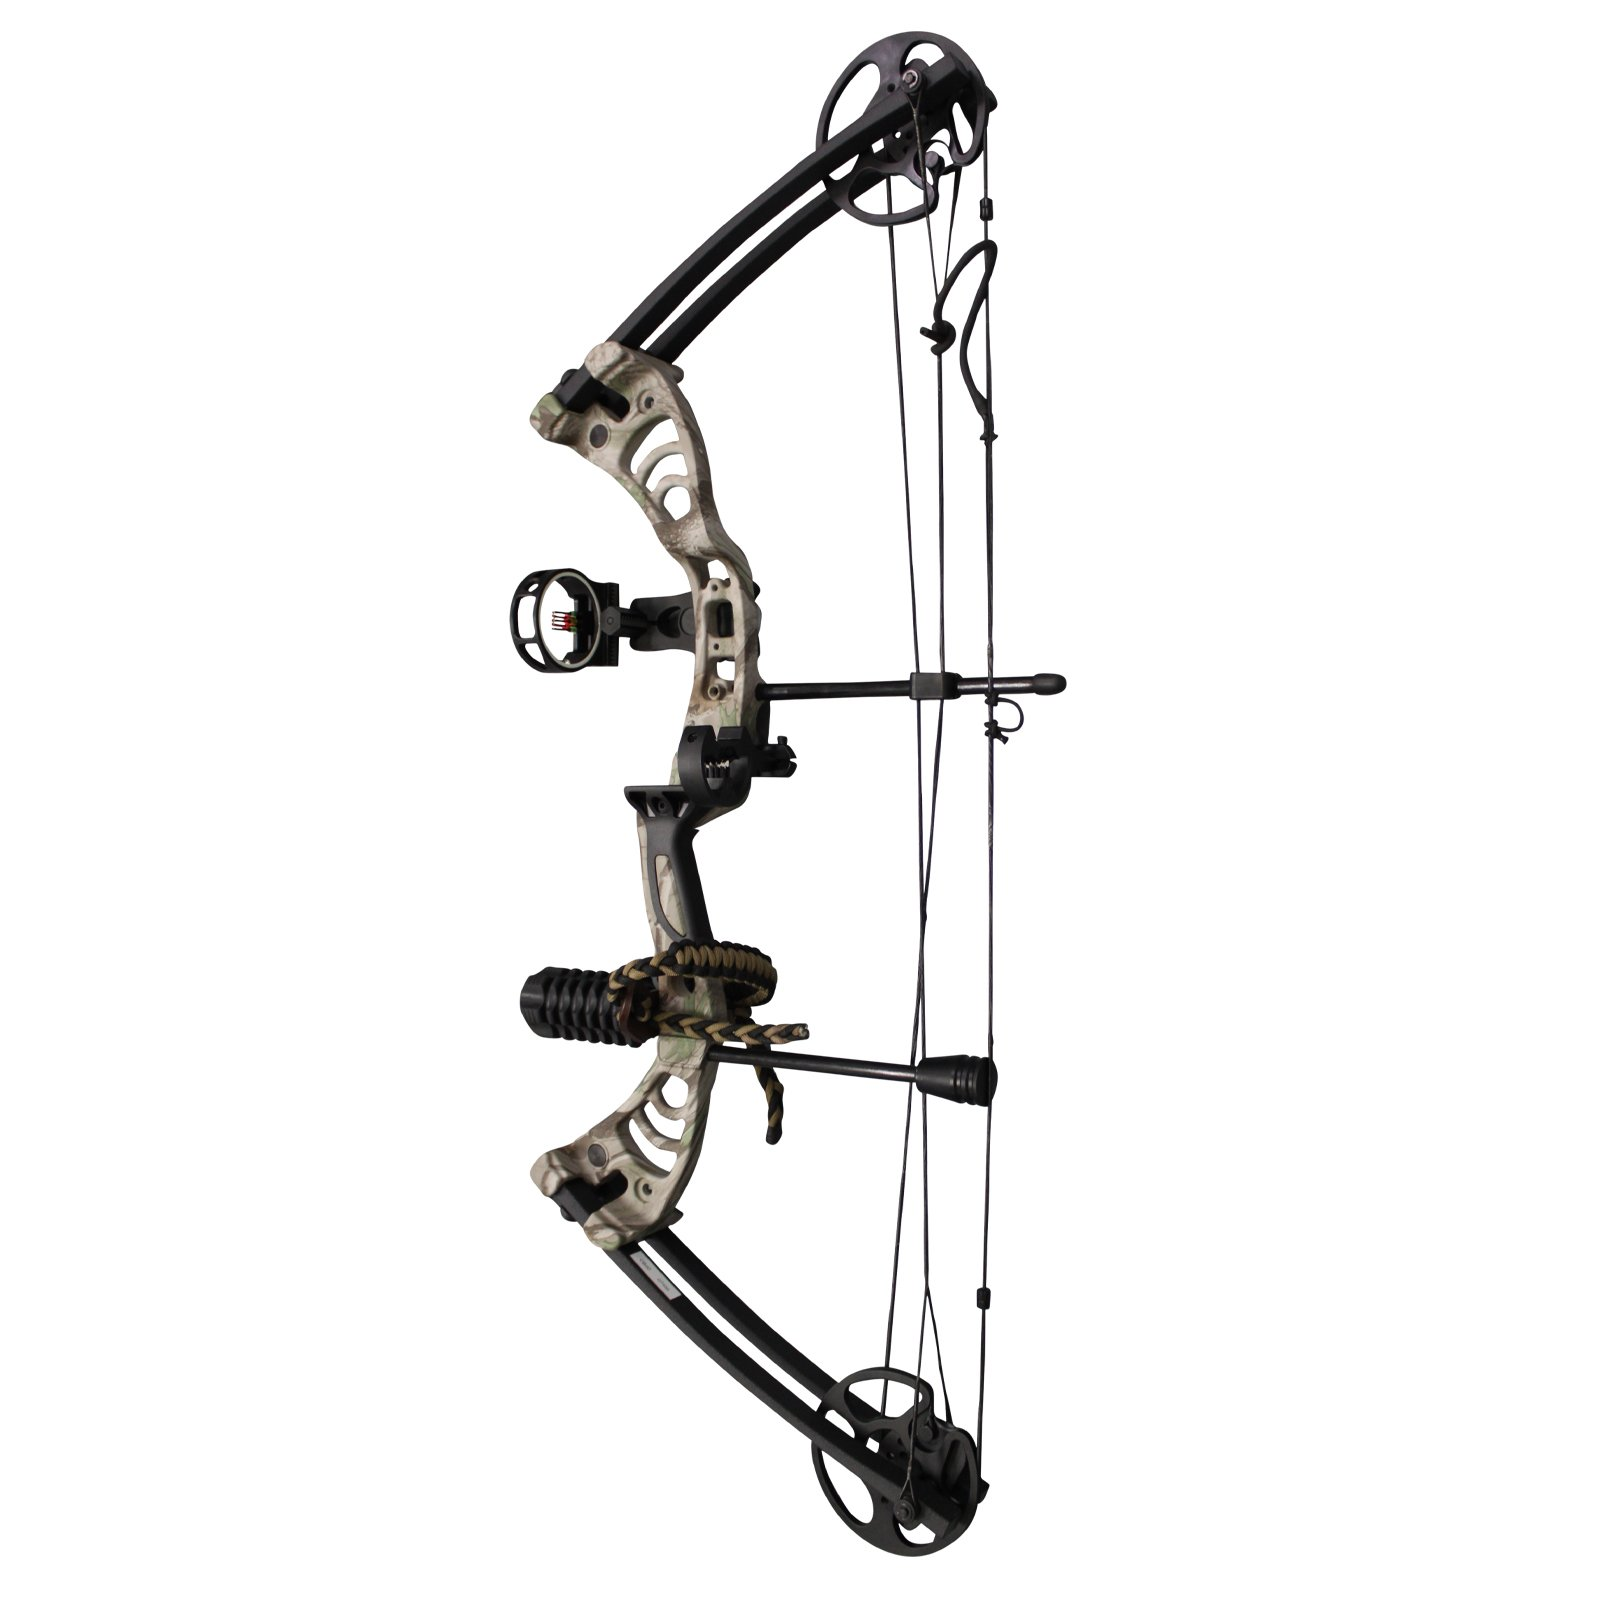 Southland Archery Supply SAS Scorpii 55 Lb 32'' Compound Bow (GC Camo w/Accessories Kit)